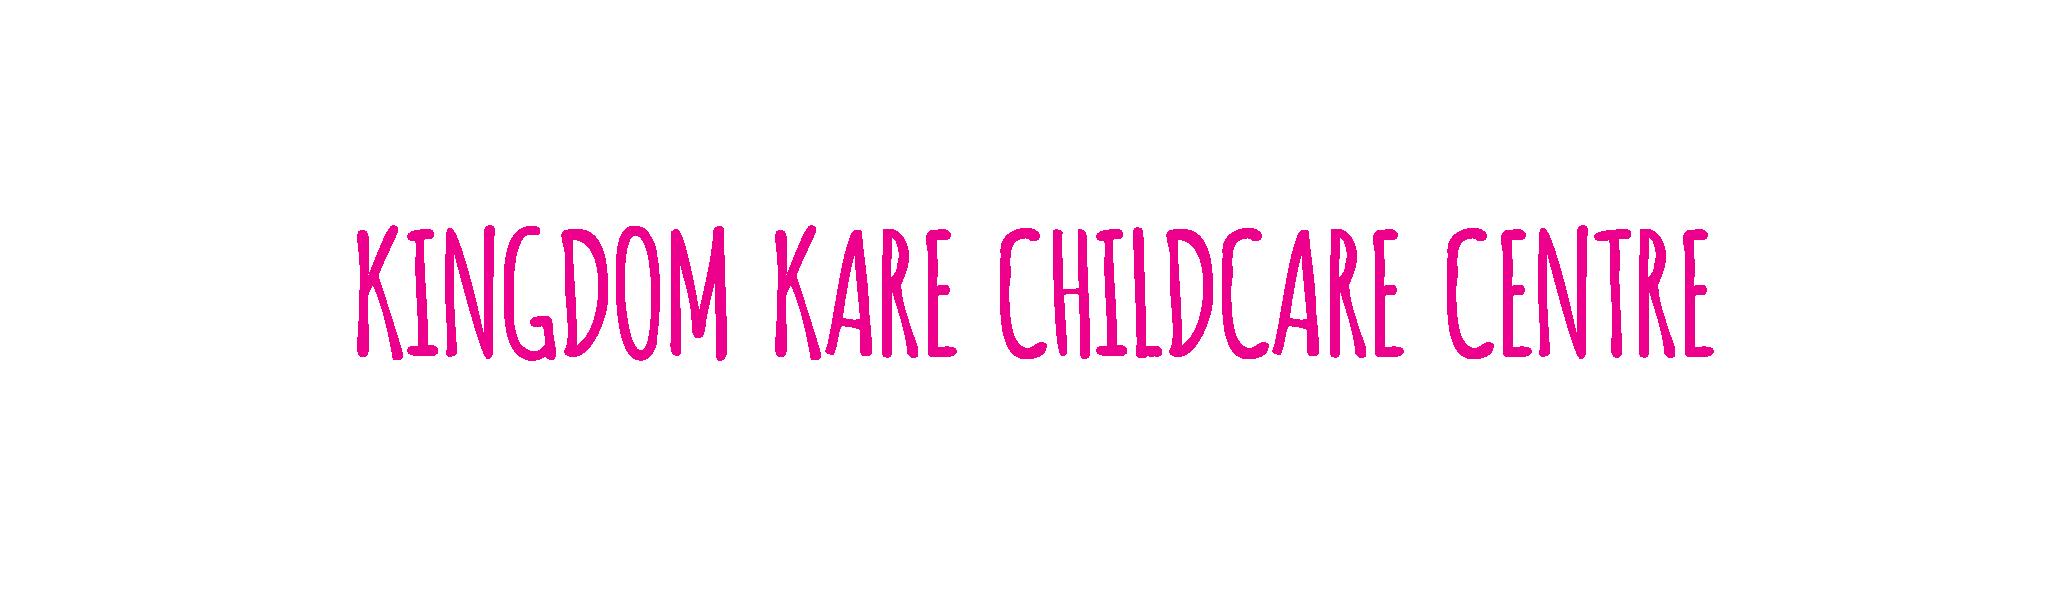 Kingdom-Kare-Childcare-Centre-Rotating-Header6.png